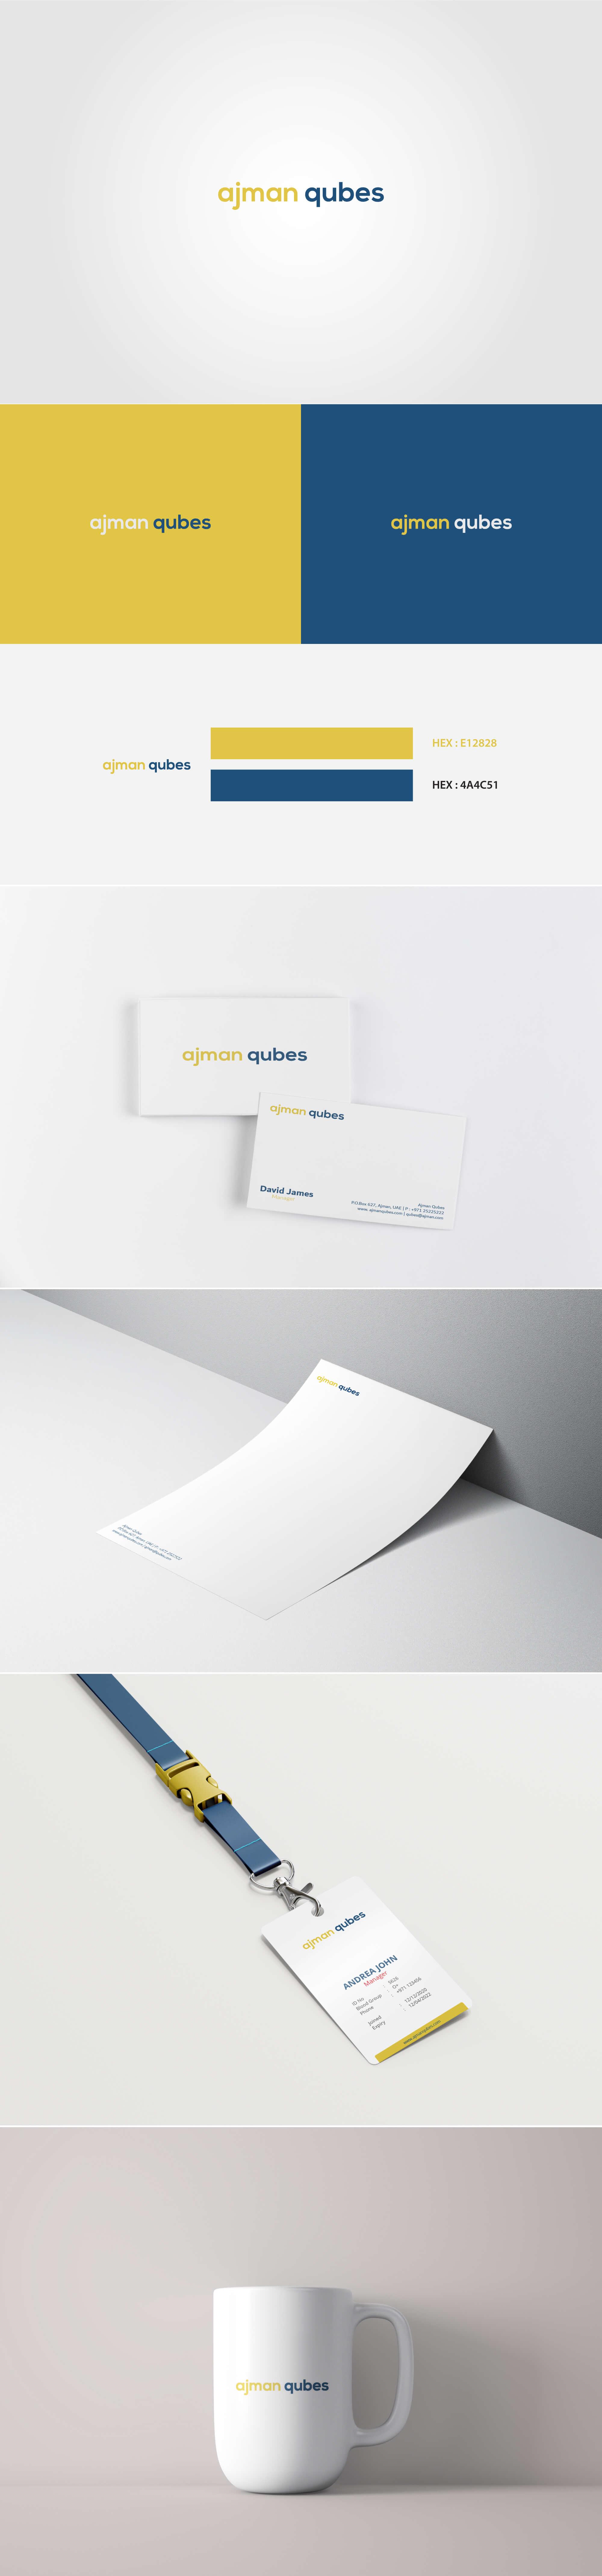 Ajman Qubes Logo by SAJID SULAIMAN